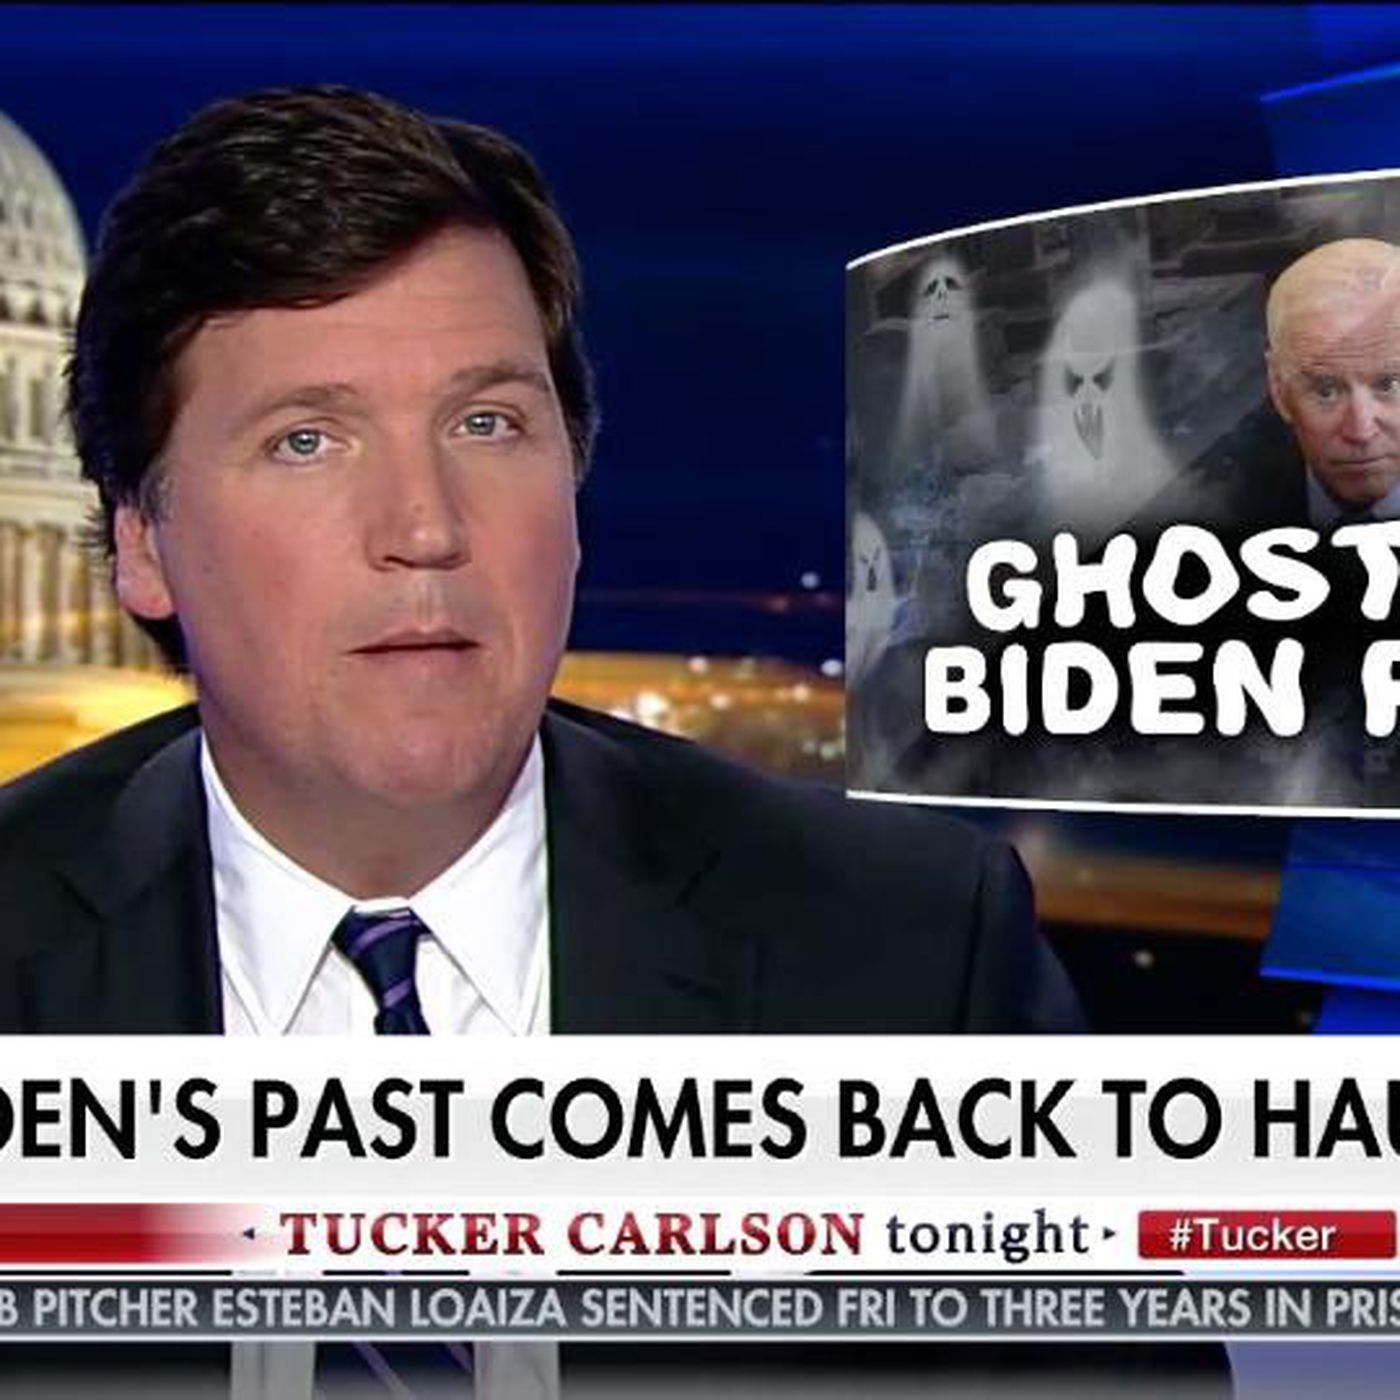 Fox News's bad weekend: Tucker Carlson and Jeanine Pirro